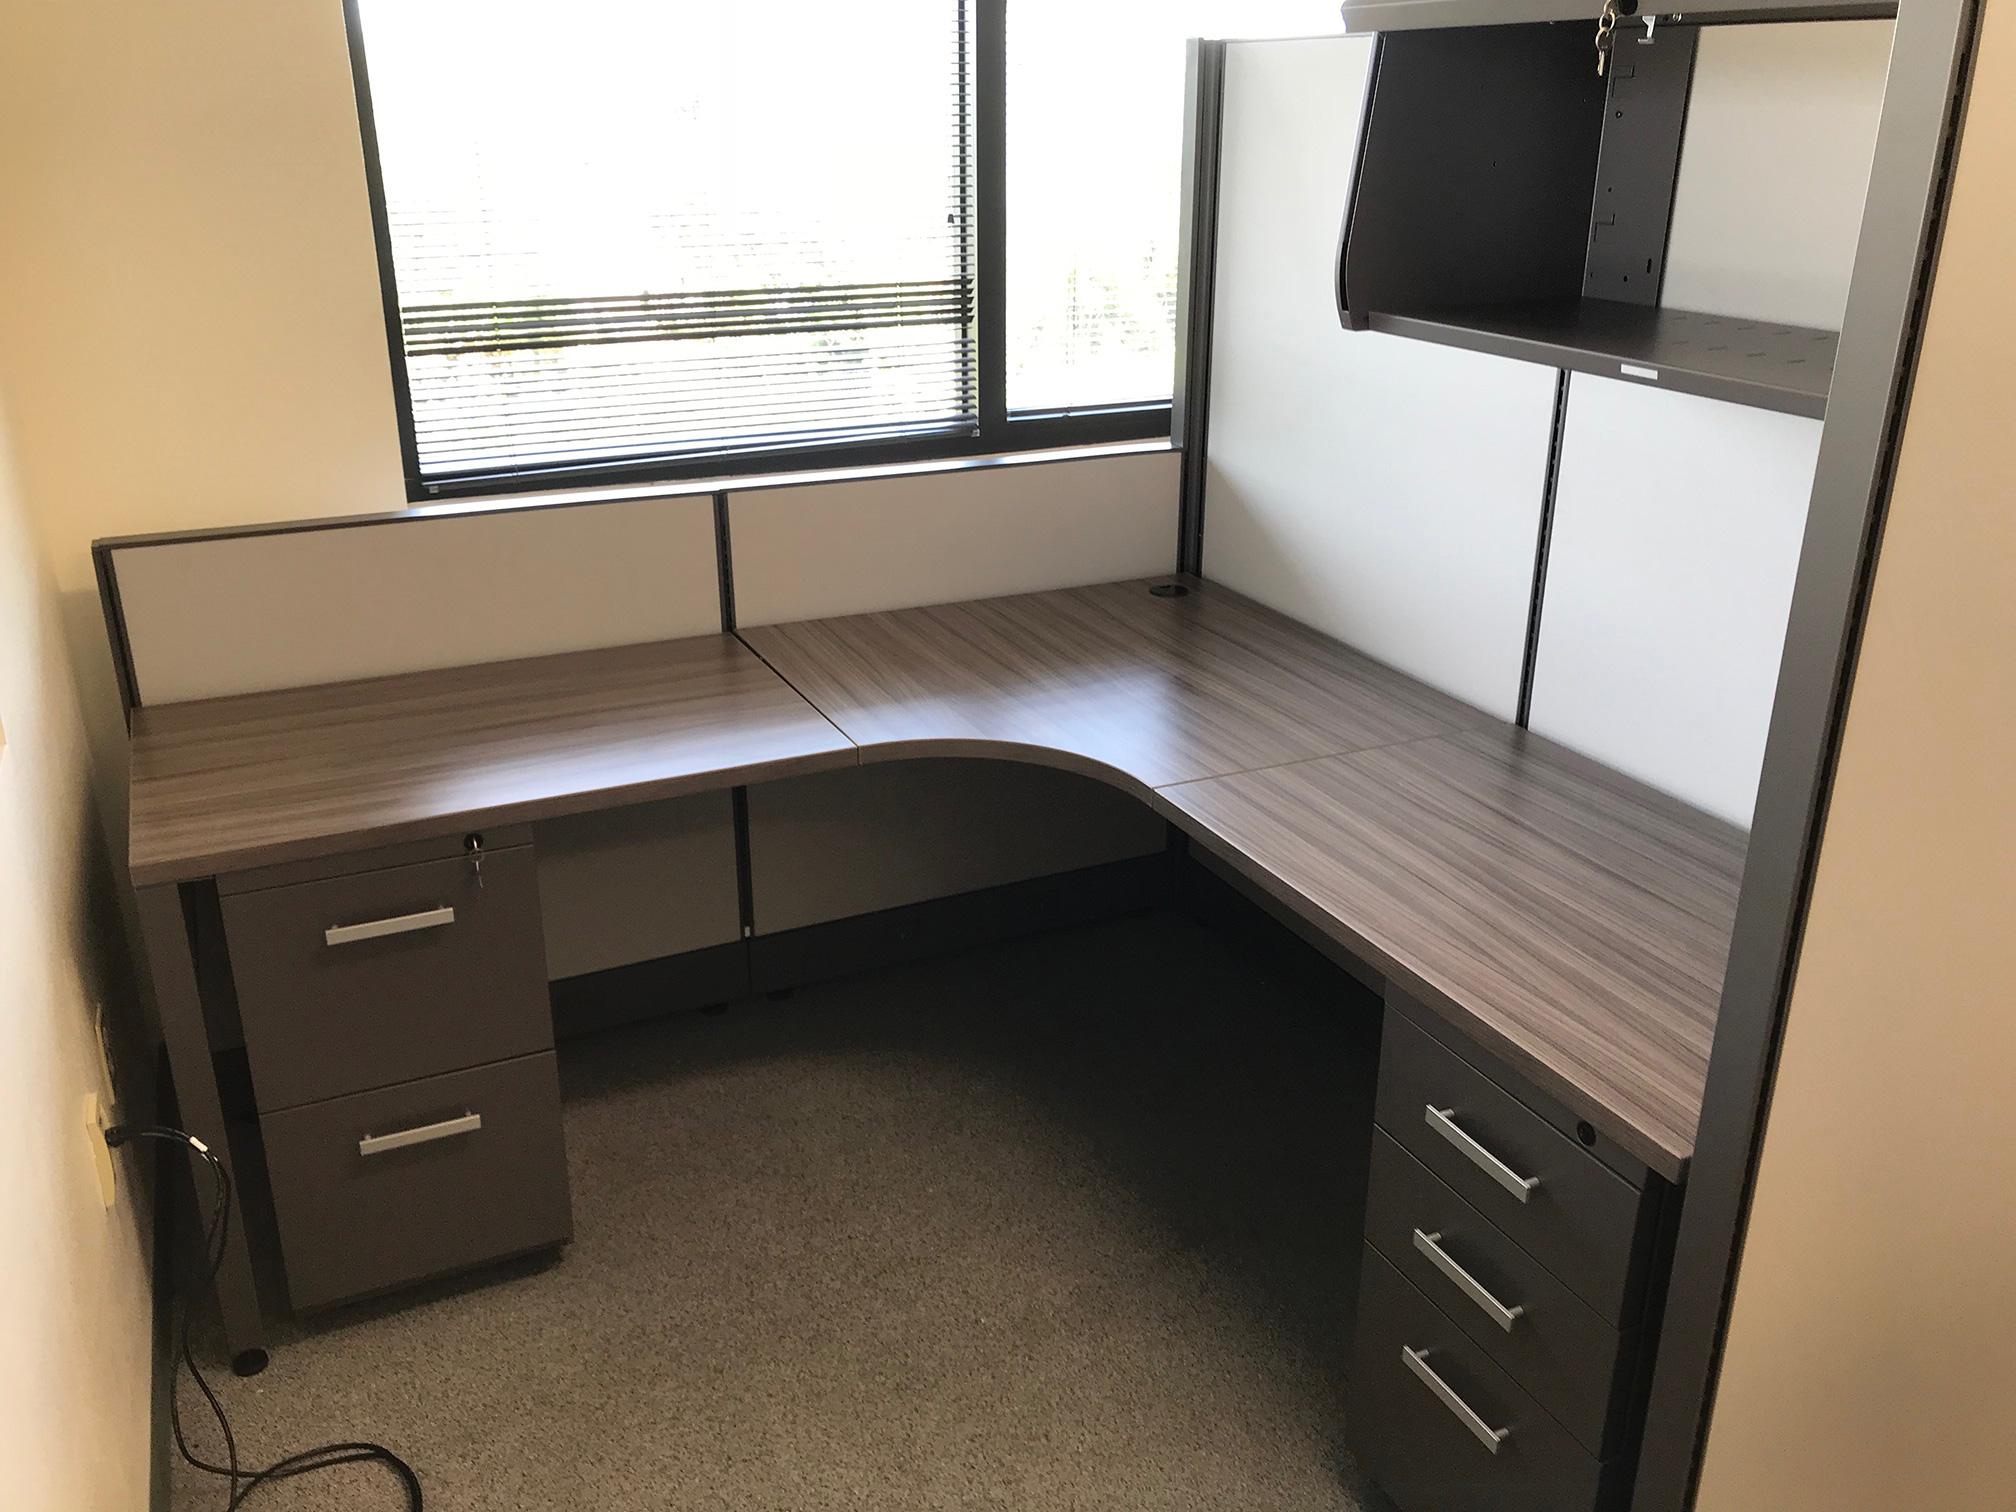 office-workstations-manasota-office-supplies-llc.jpg